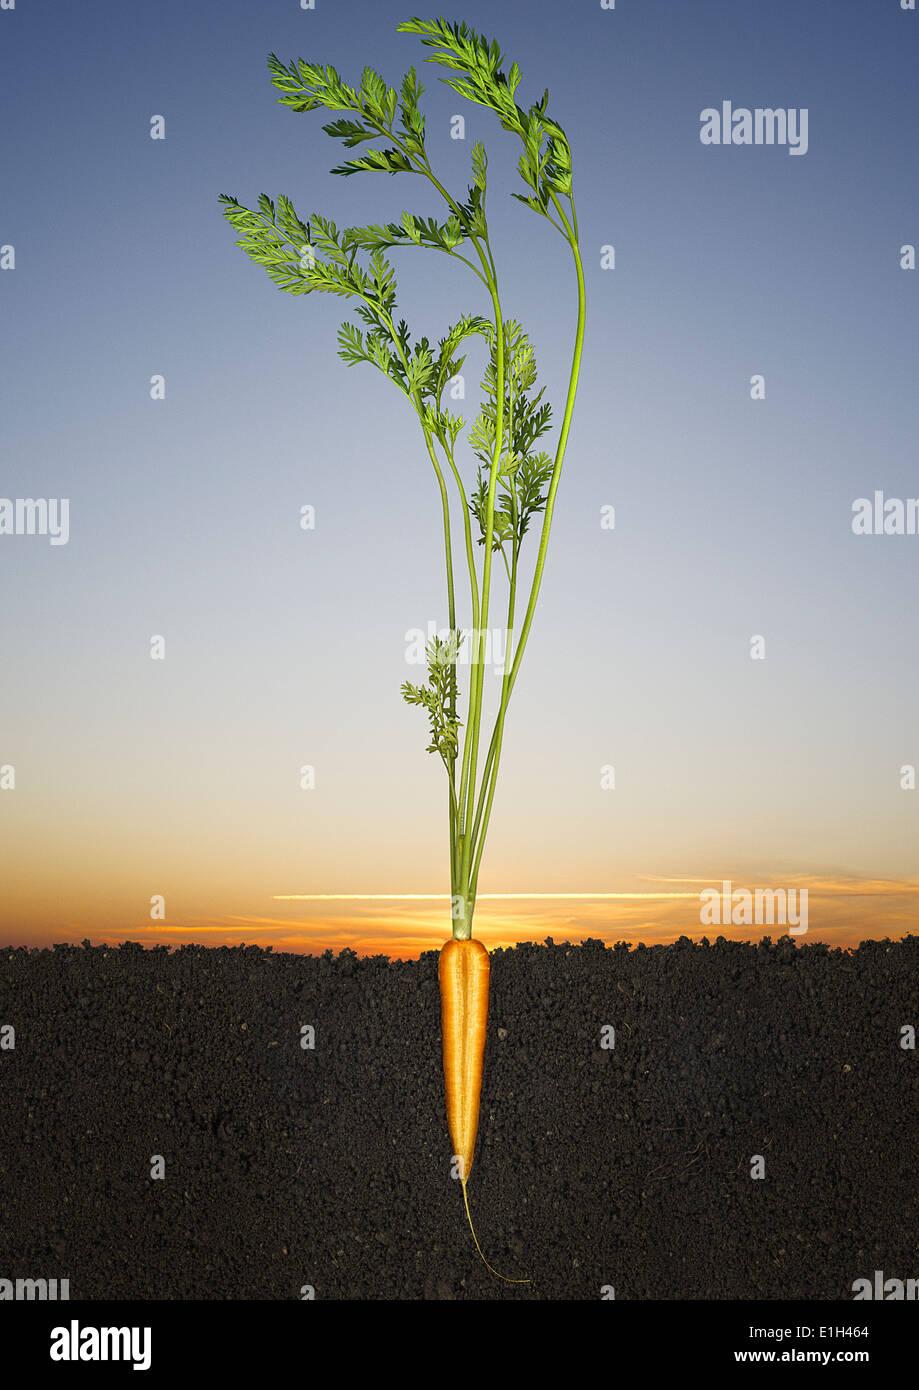 Halved carrot growing in soil - Stock Image